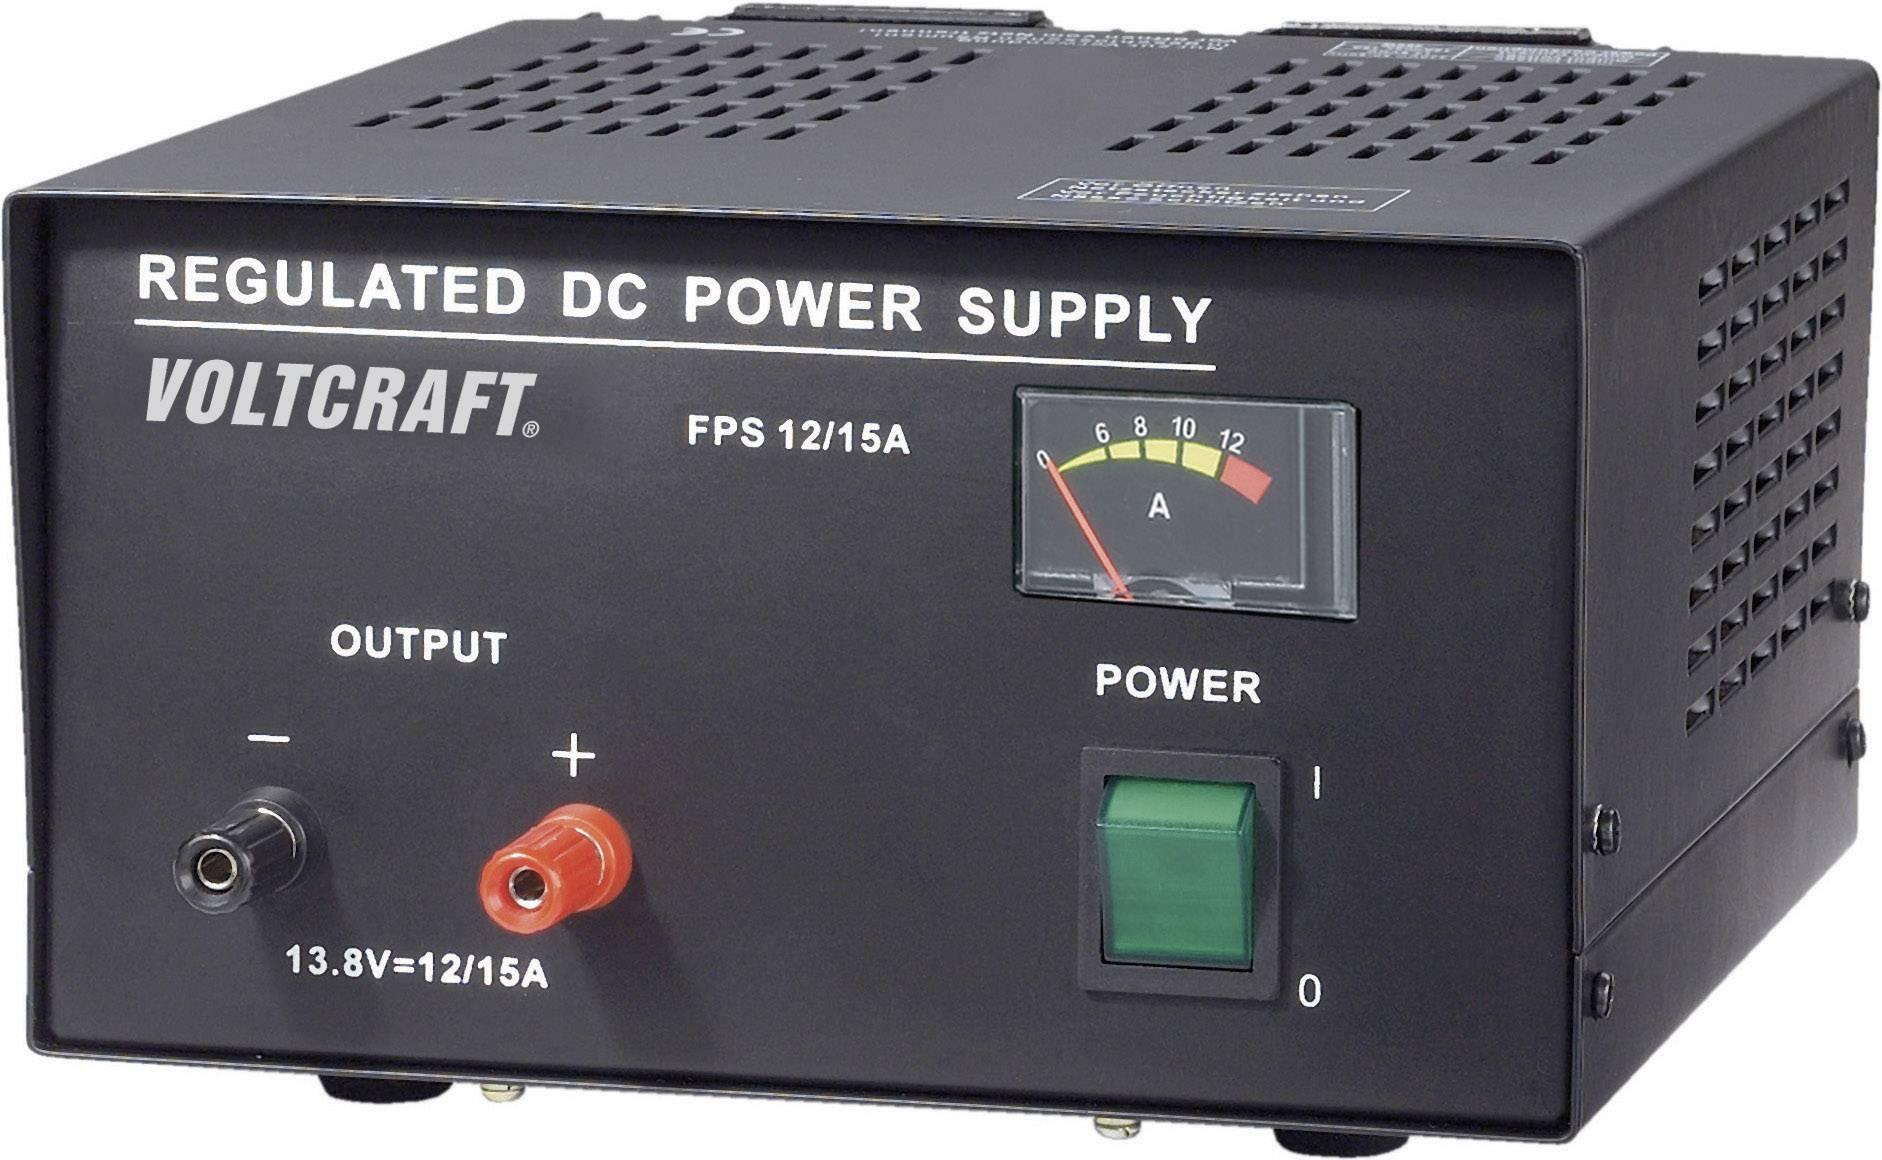 Sietový zdroj so stabilným napätím Voltcraft FSP-11312, 13.8 VDC, 12 A